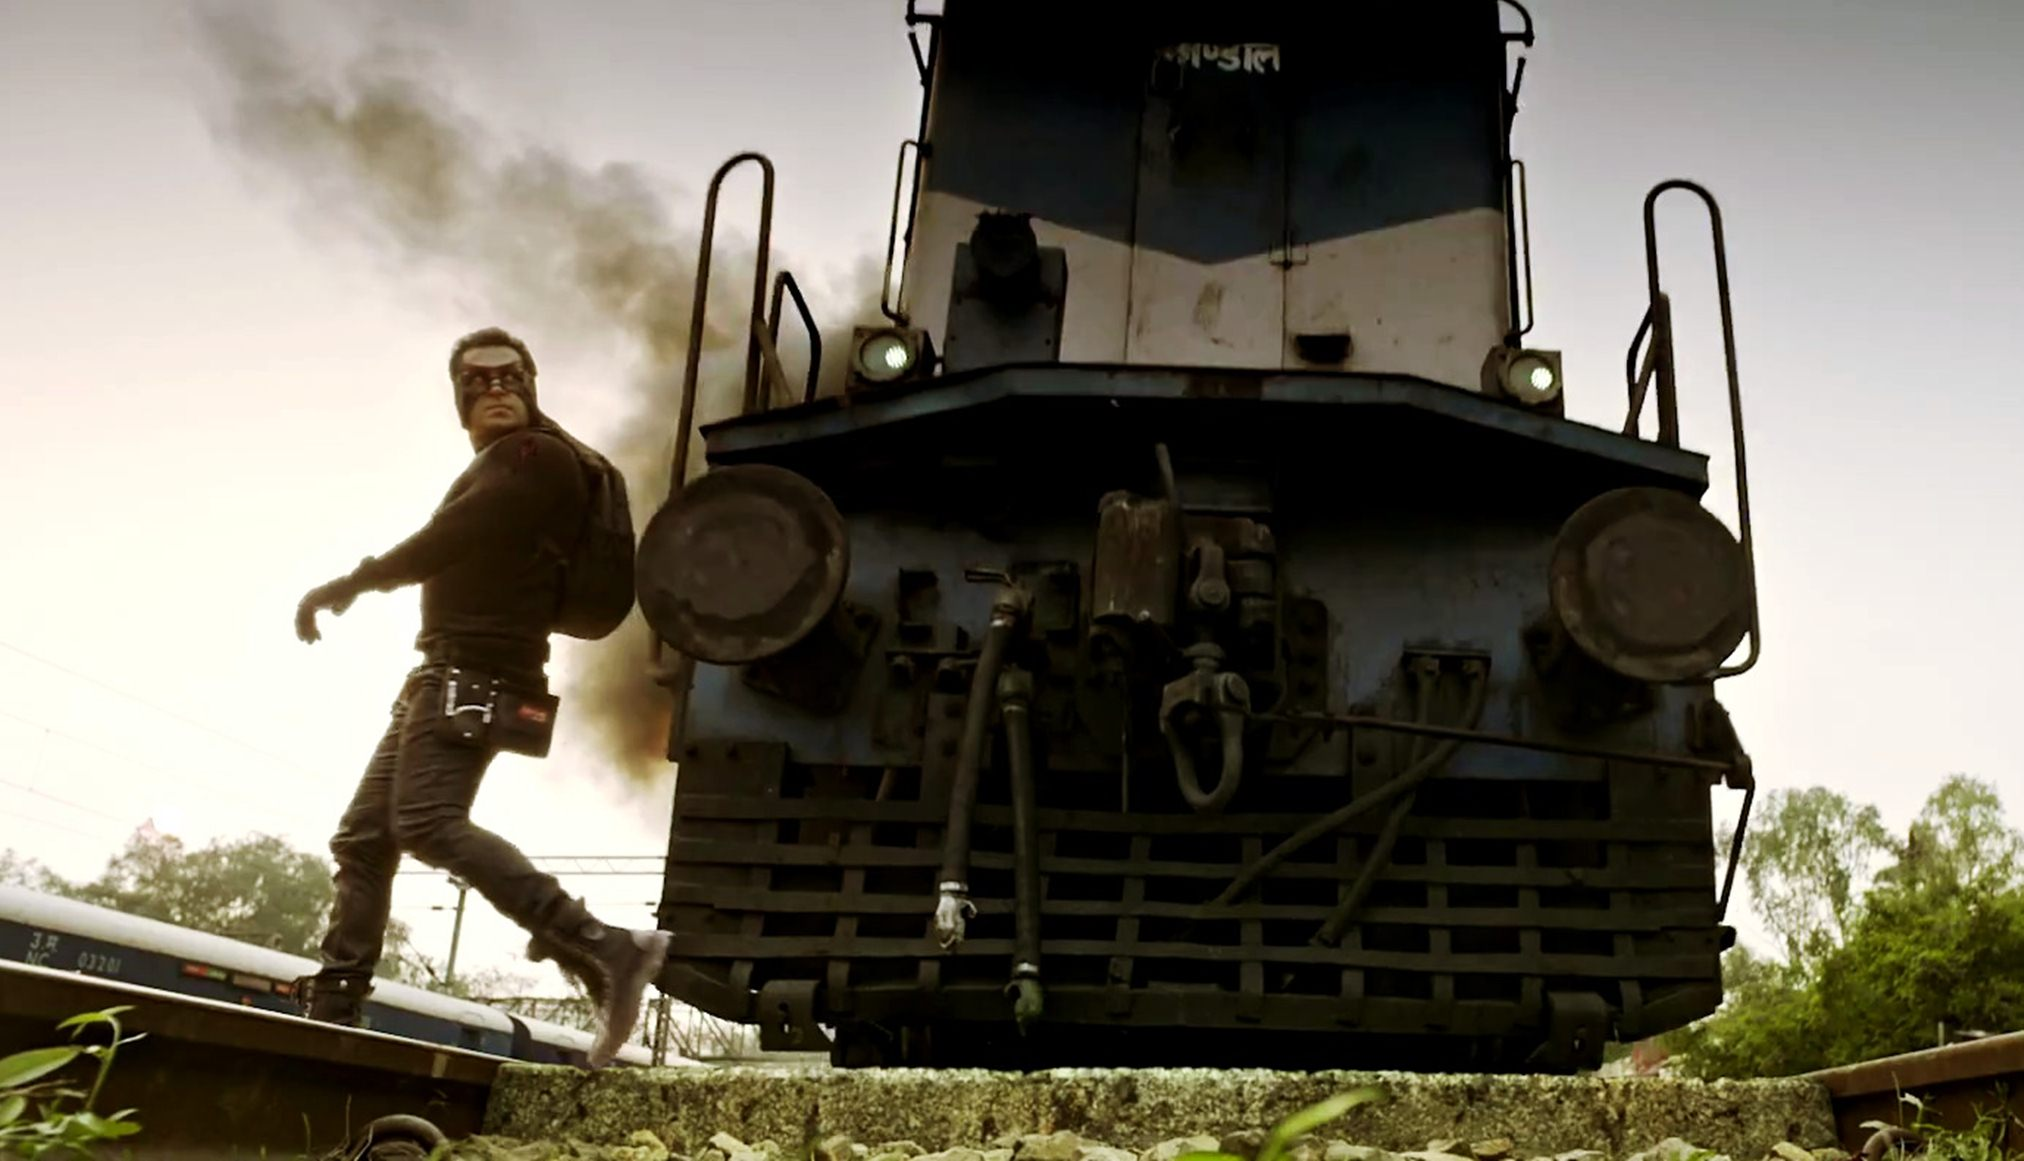 Salman Khan Kick | My Journey So Far…